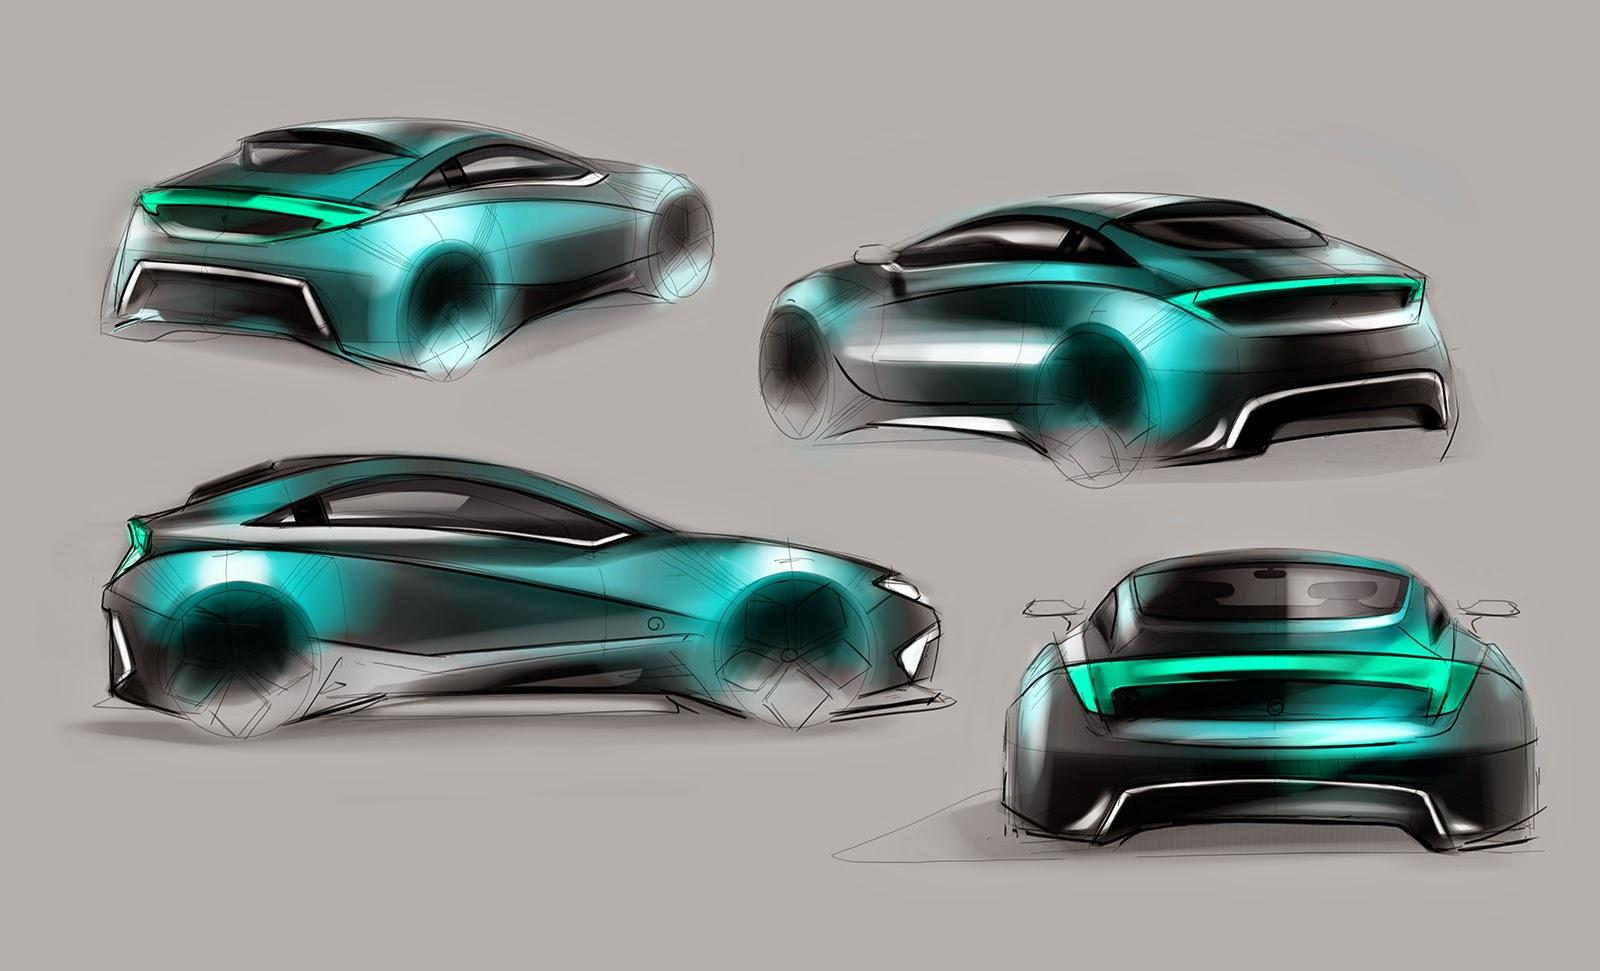 Review Car Design Tutorials Editions 1 2 3 4 Cardesignpro